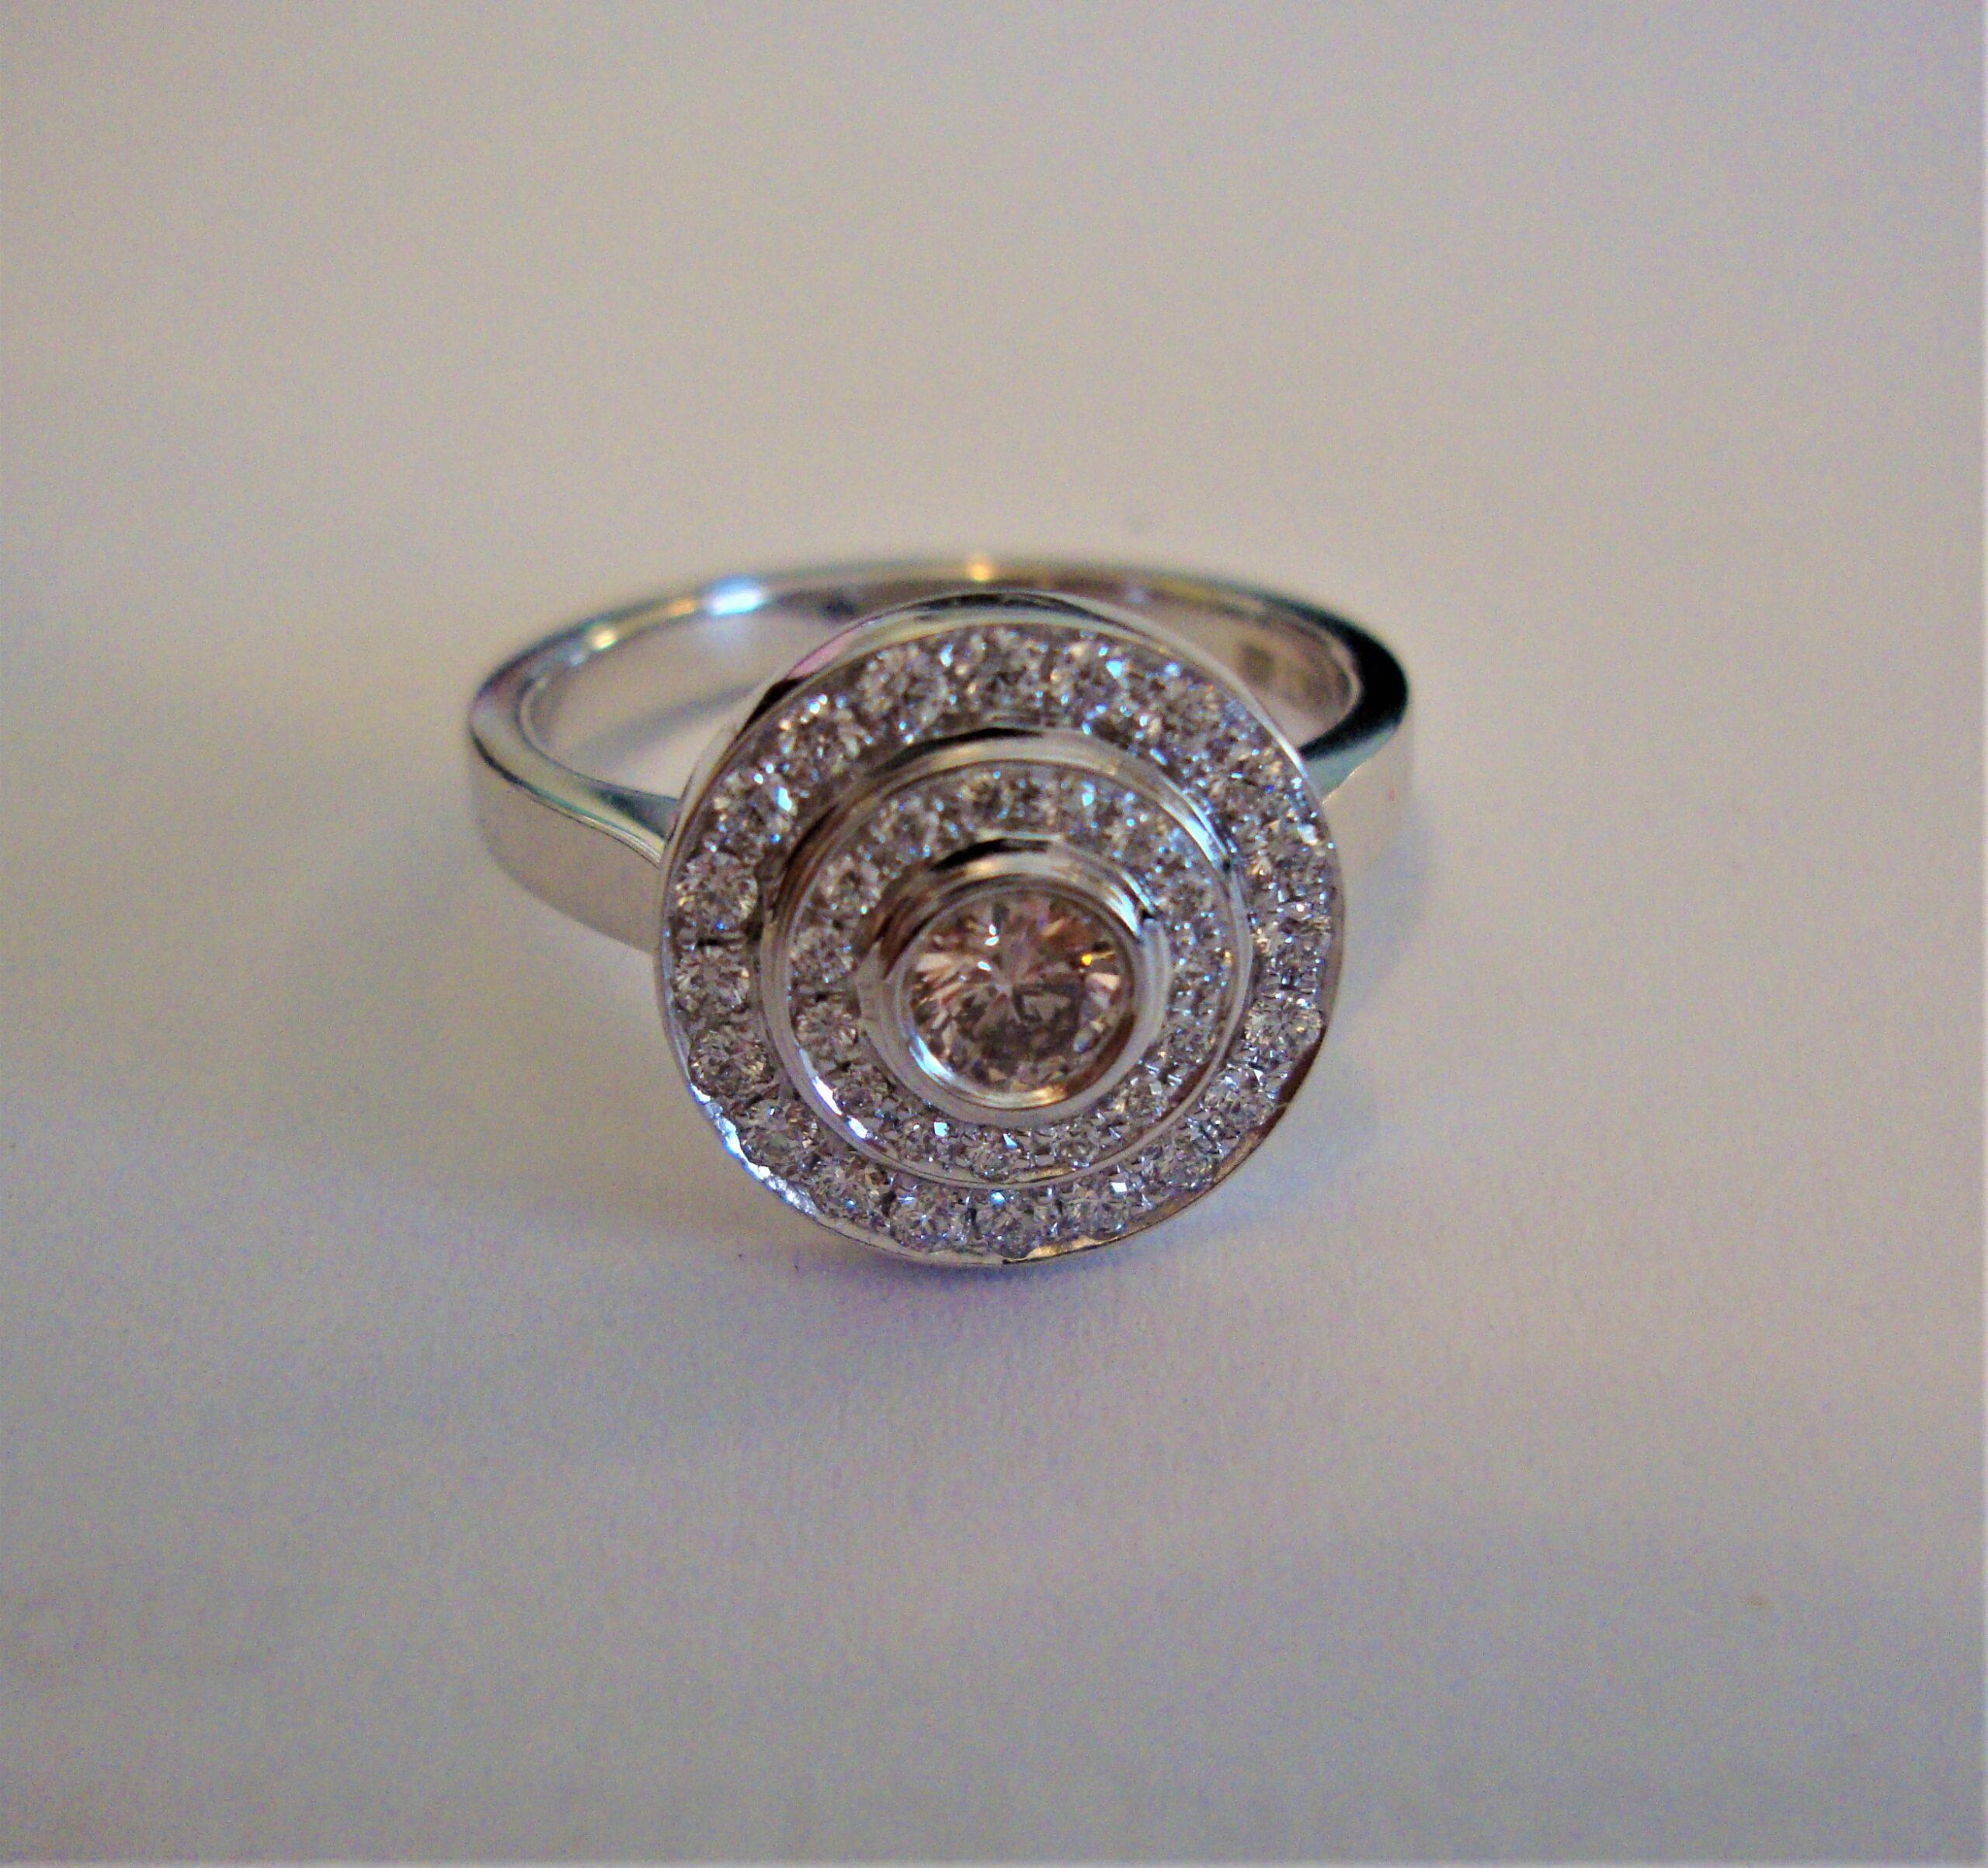 Lady's 0.15ct Argyle Pink Diamond Ring (0.47ct TW estimated)